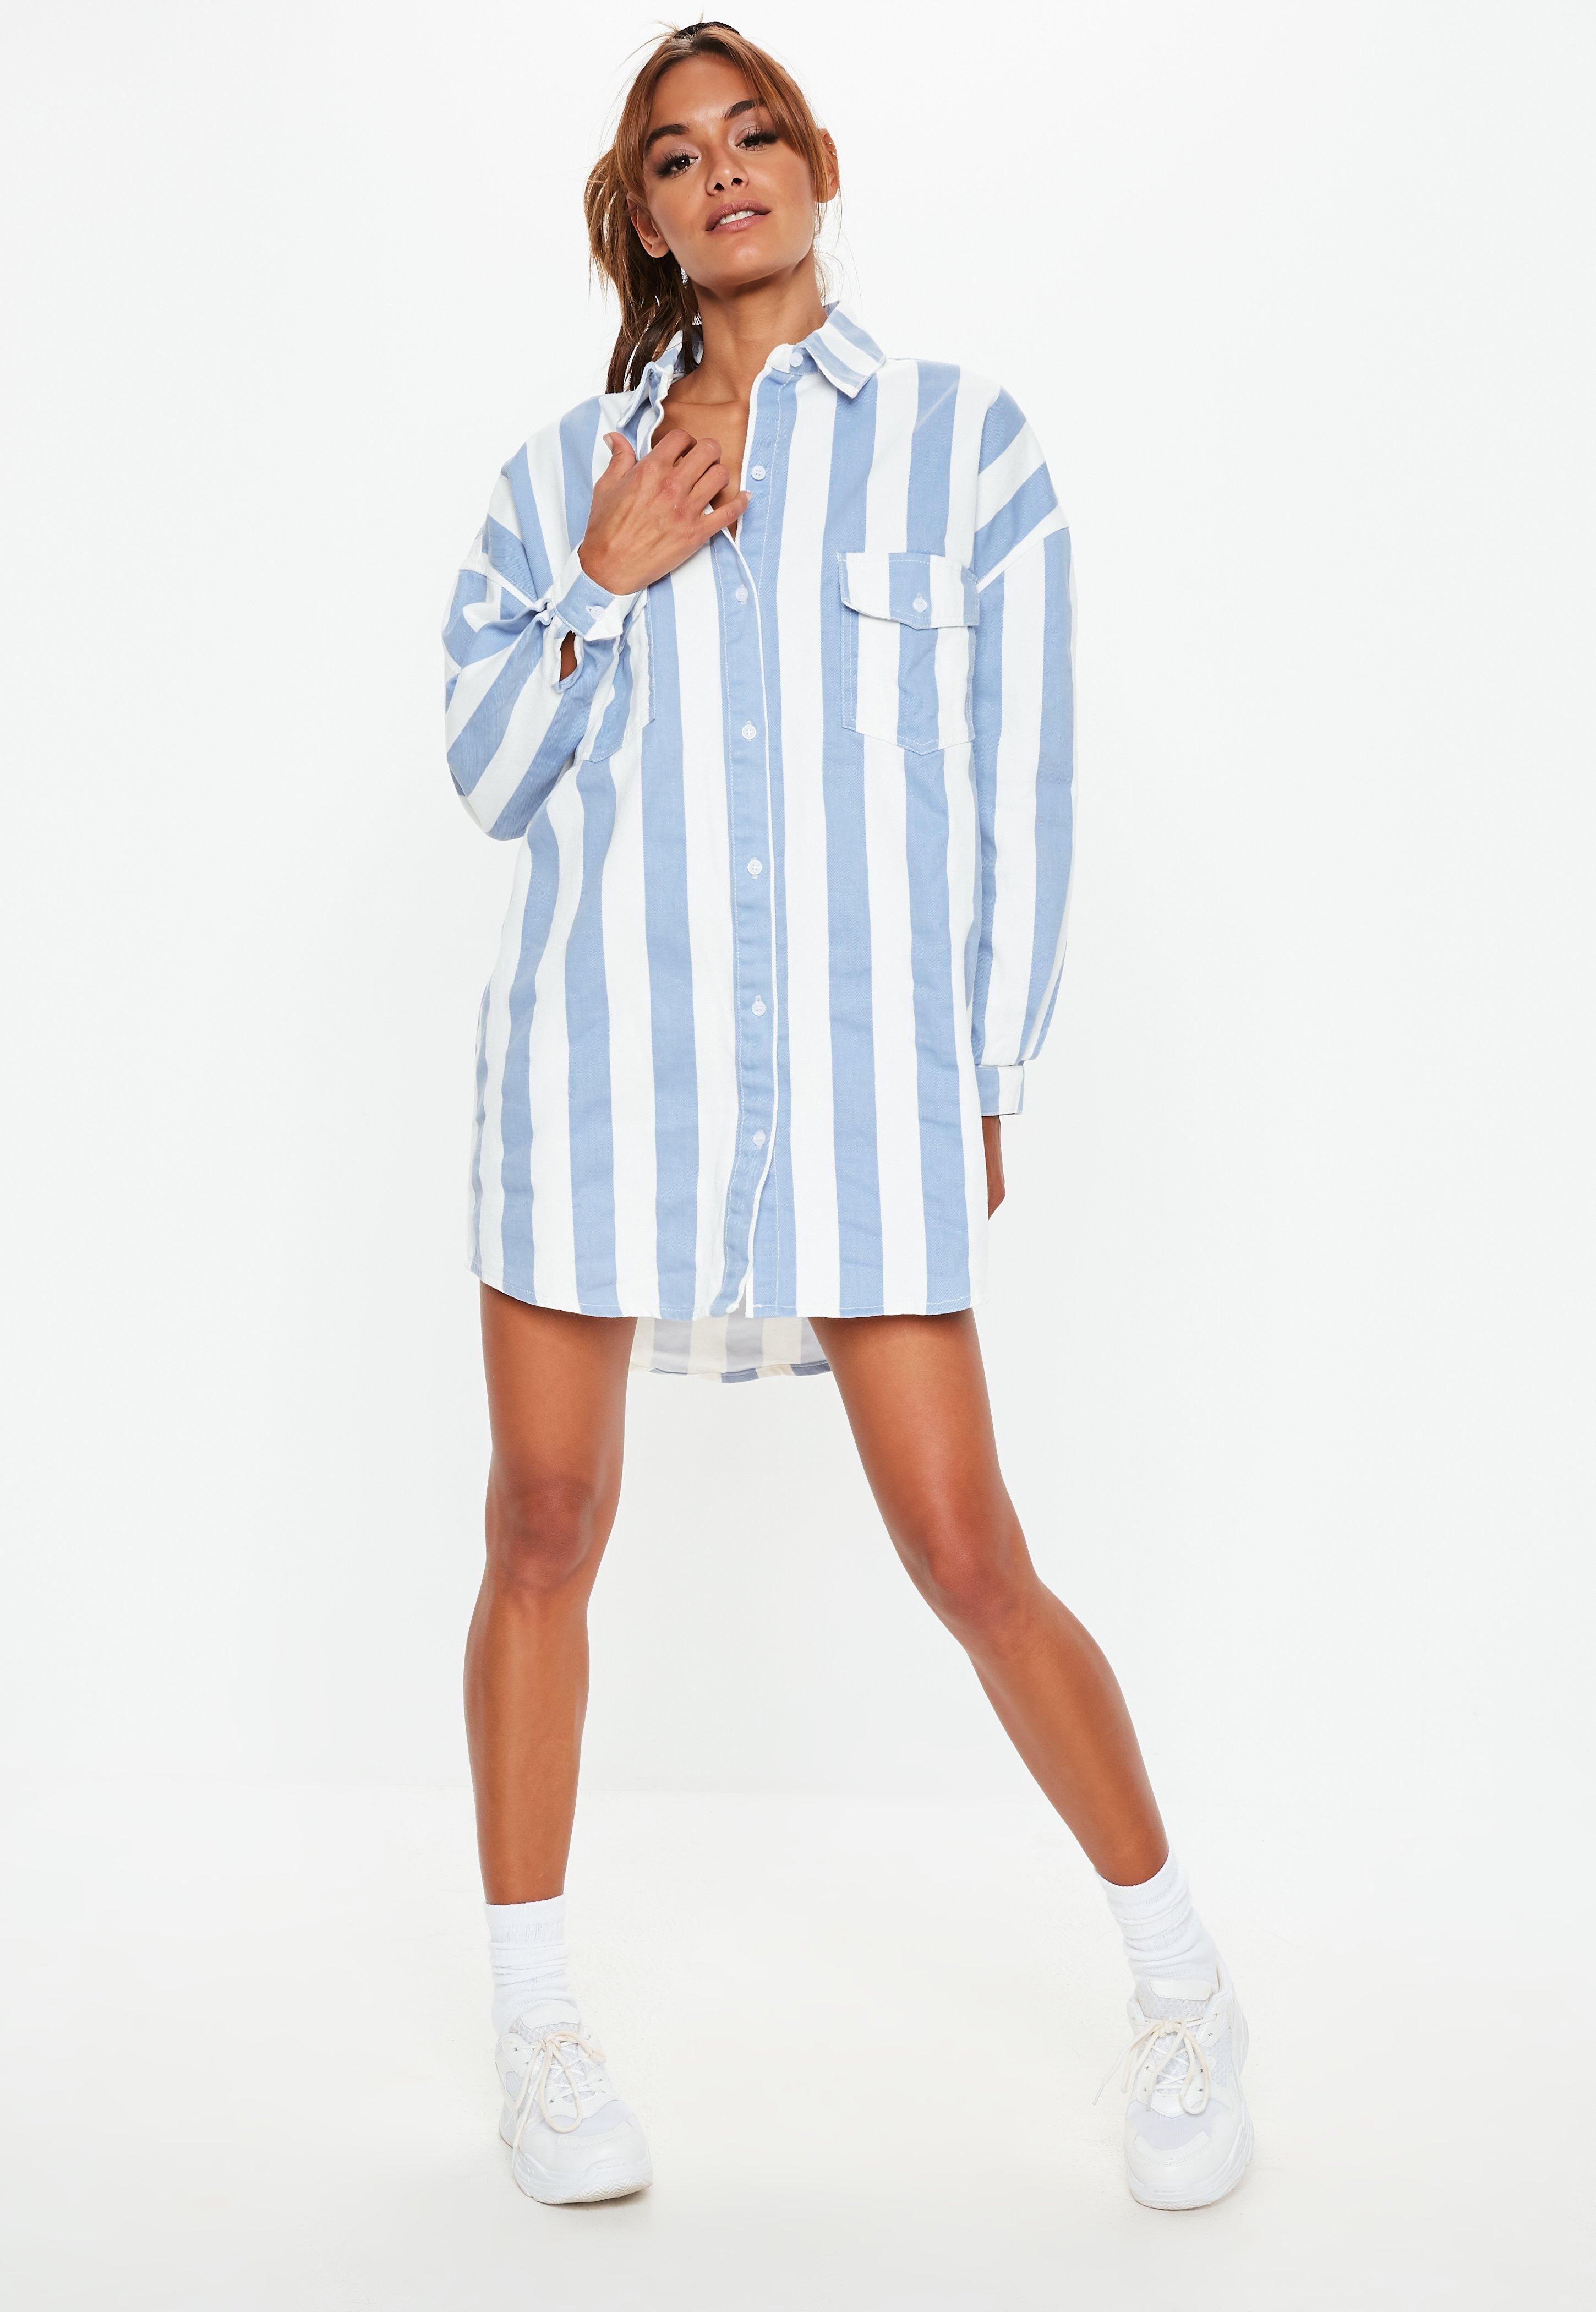 a44e9161f73 Robe-chemise